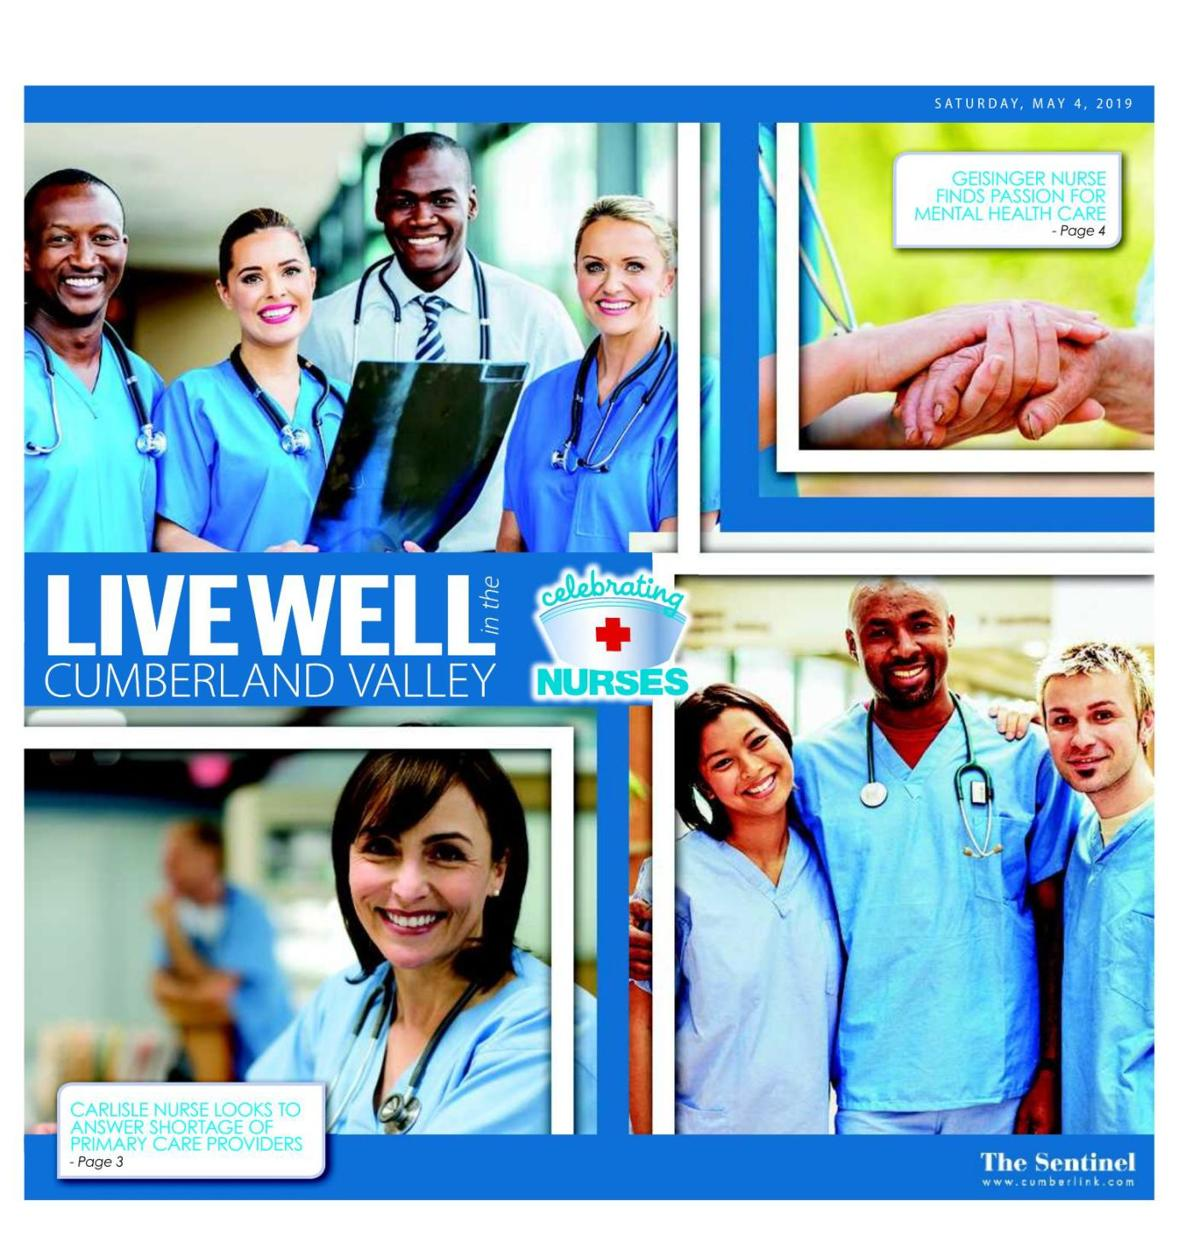 Live Well - Celebrating Nurses